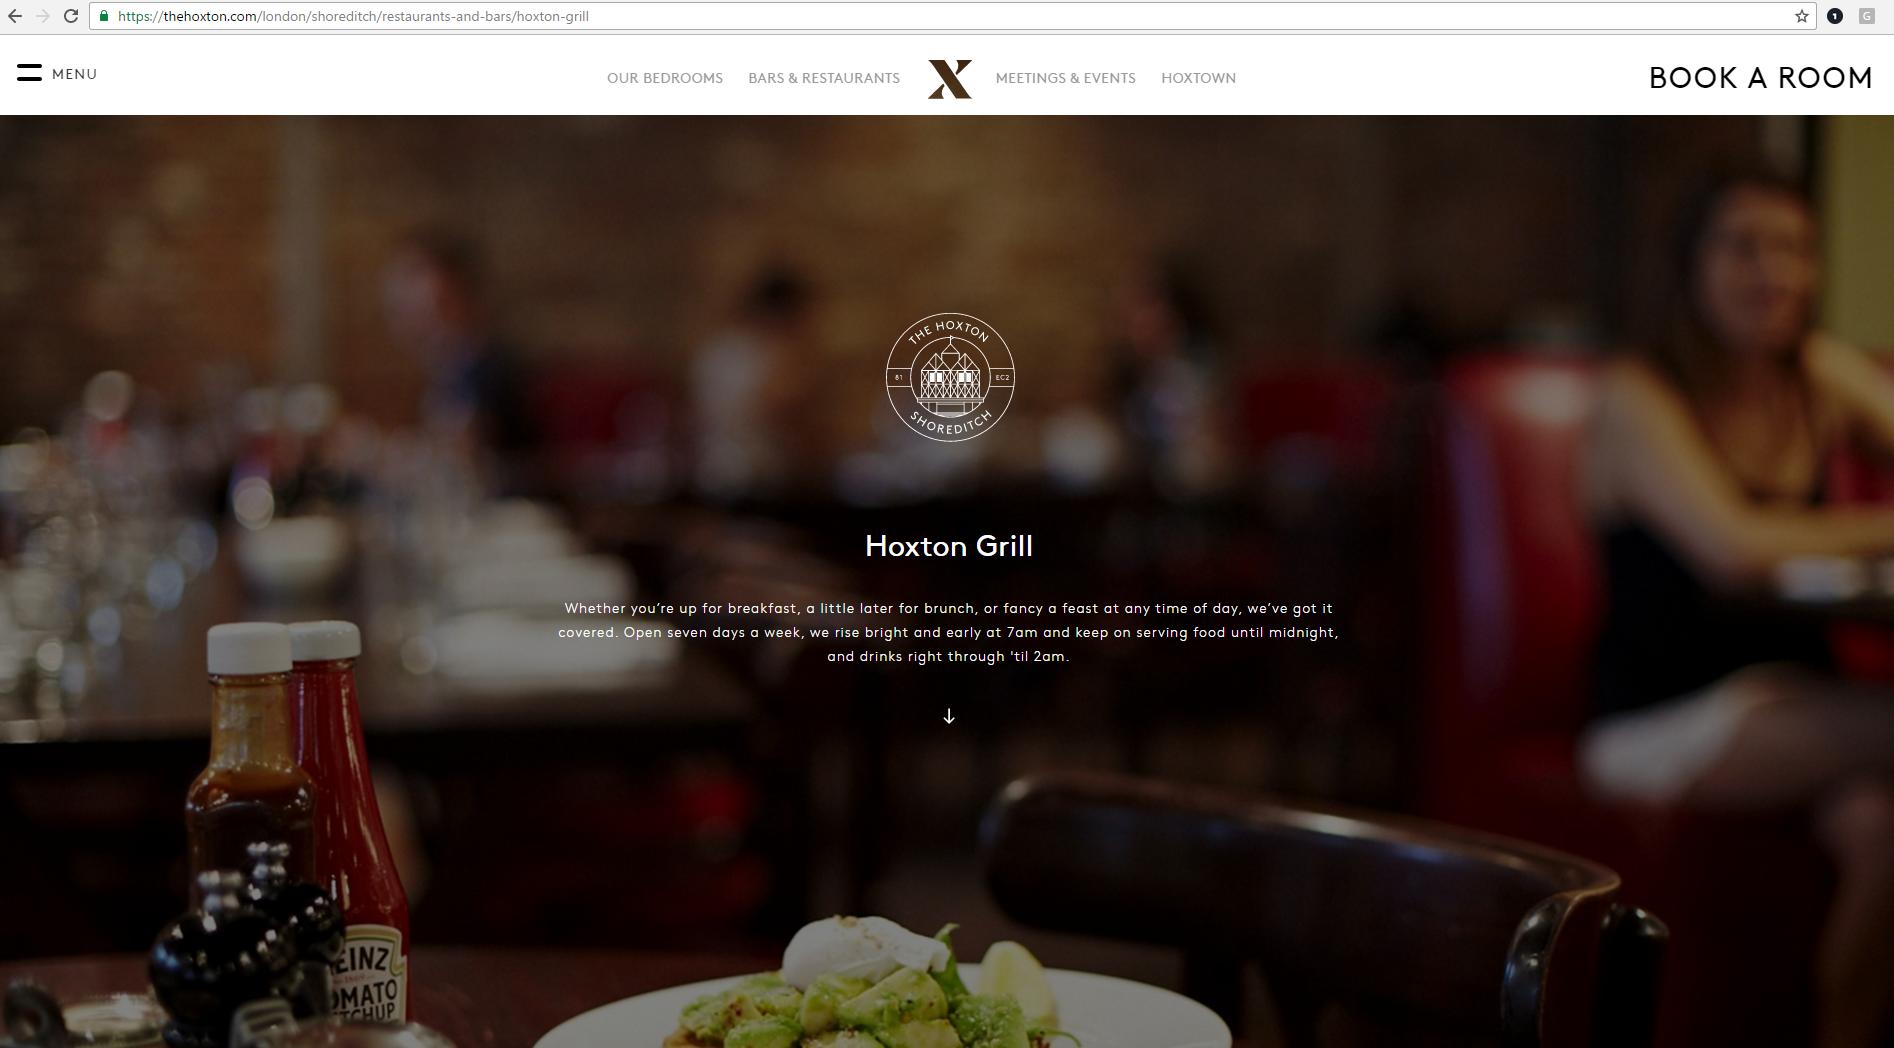 The Hoxton Restaurant Website